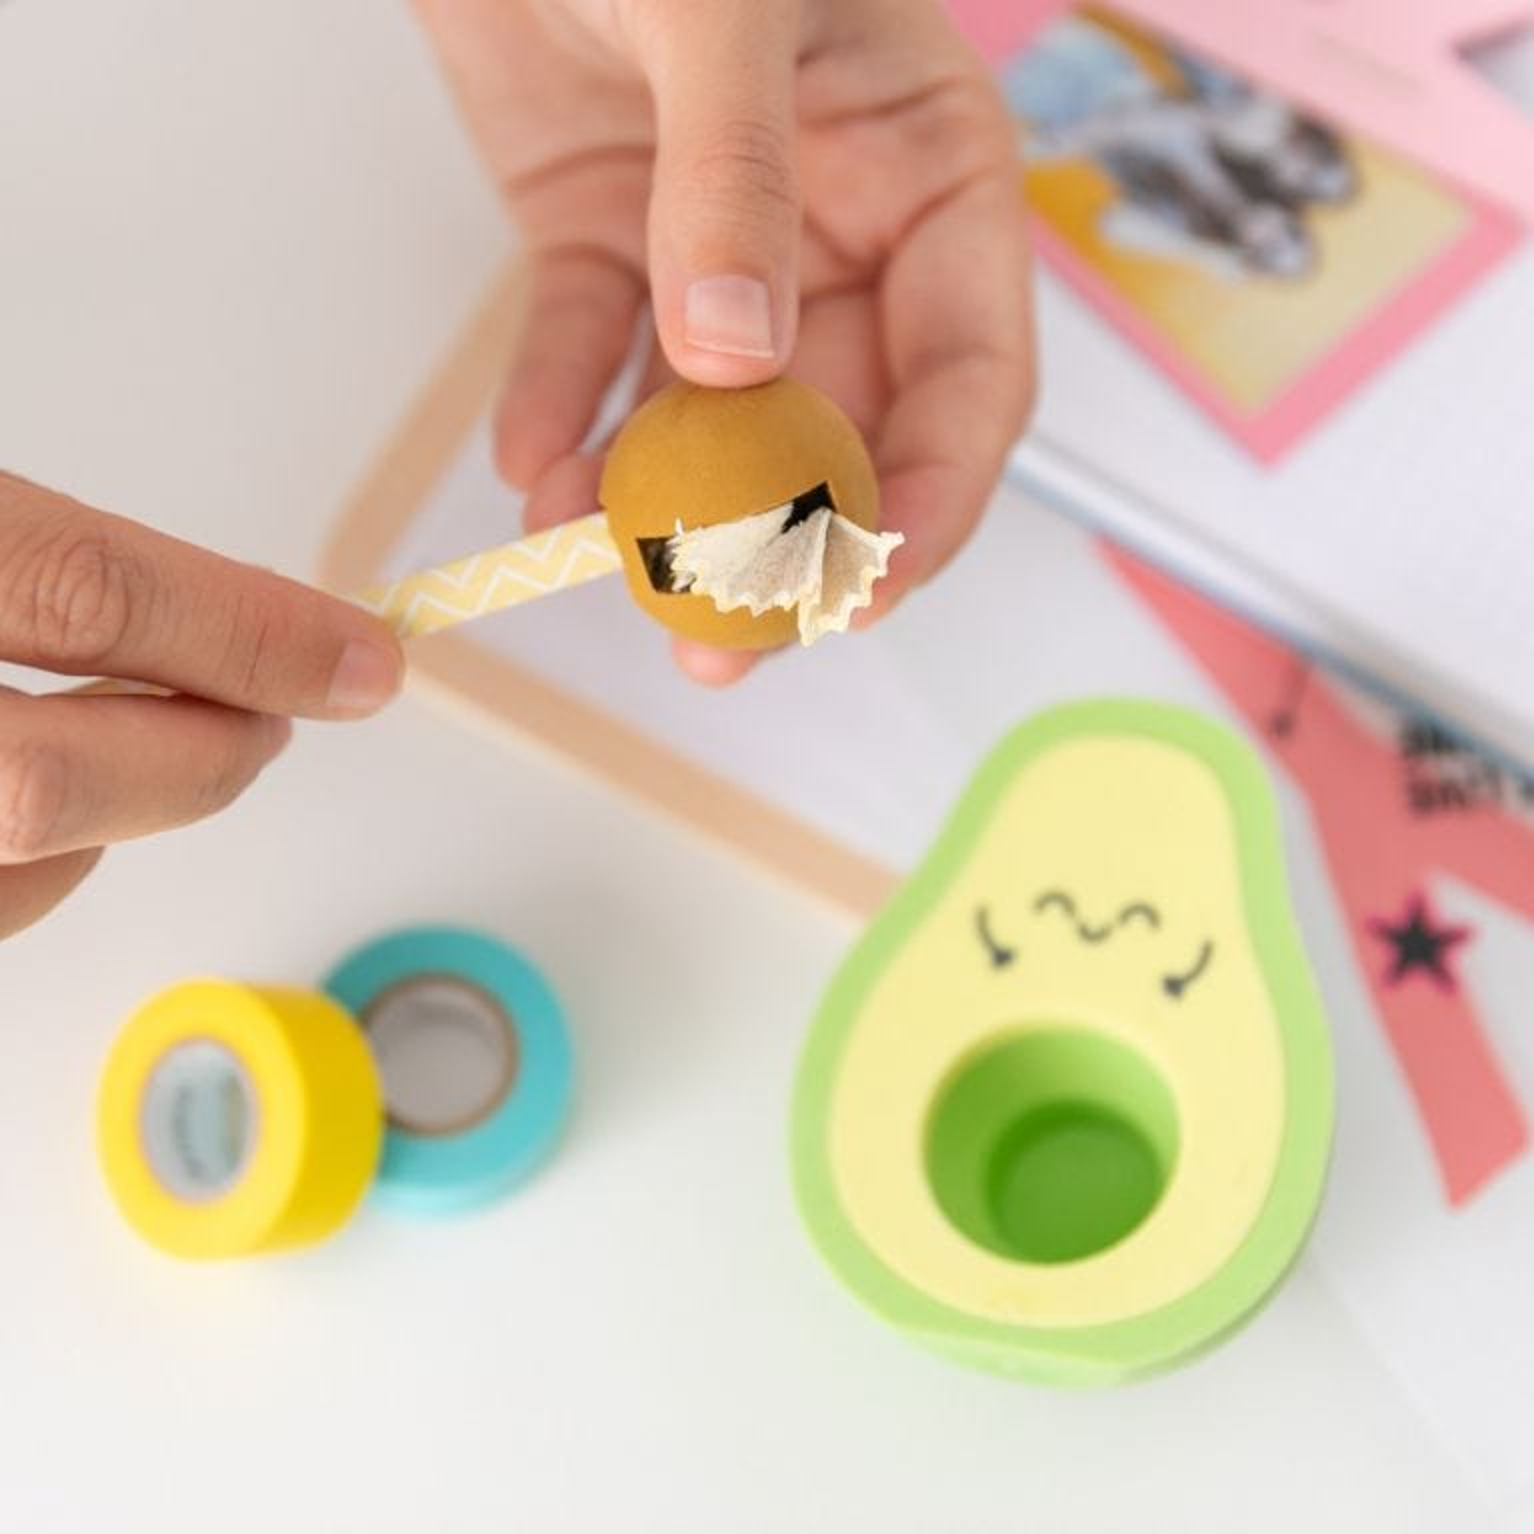 Set of eraser + pencil sharpener - Avocado